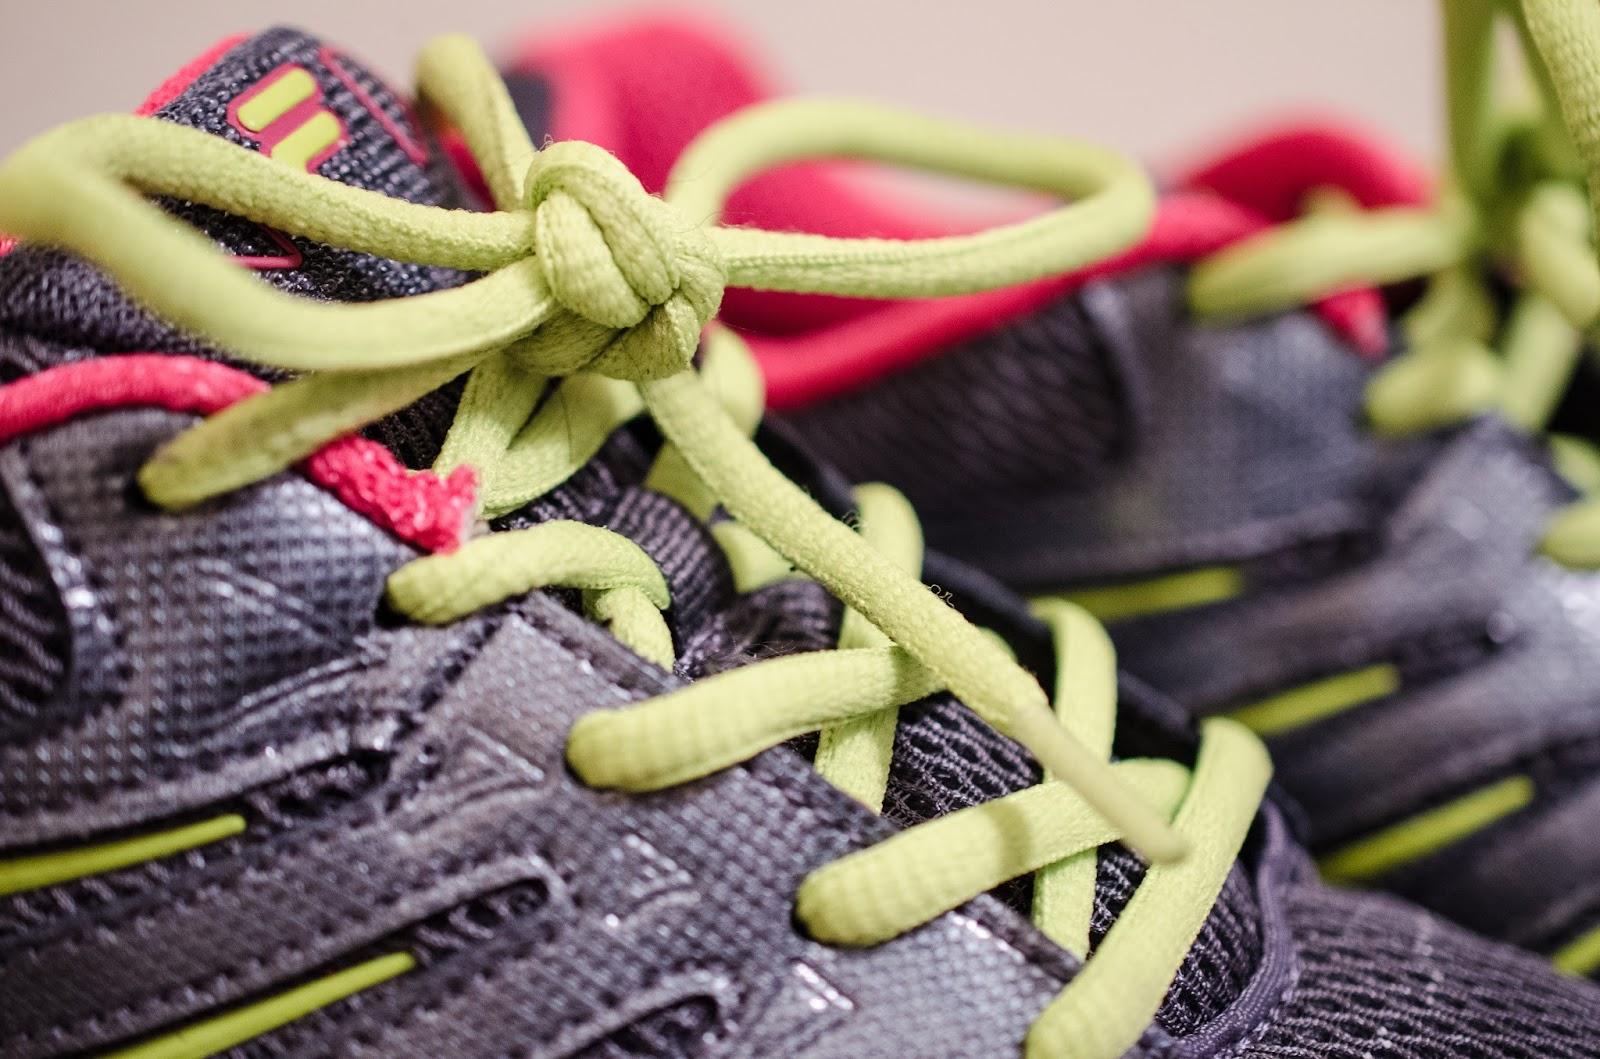 Dietary antioxidants and sports